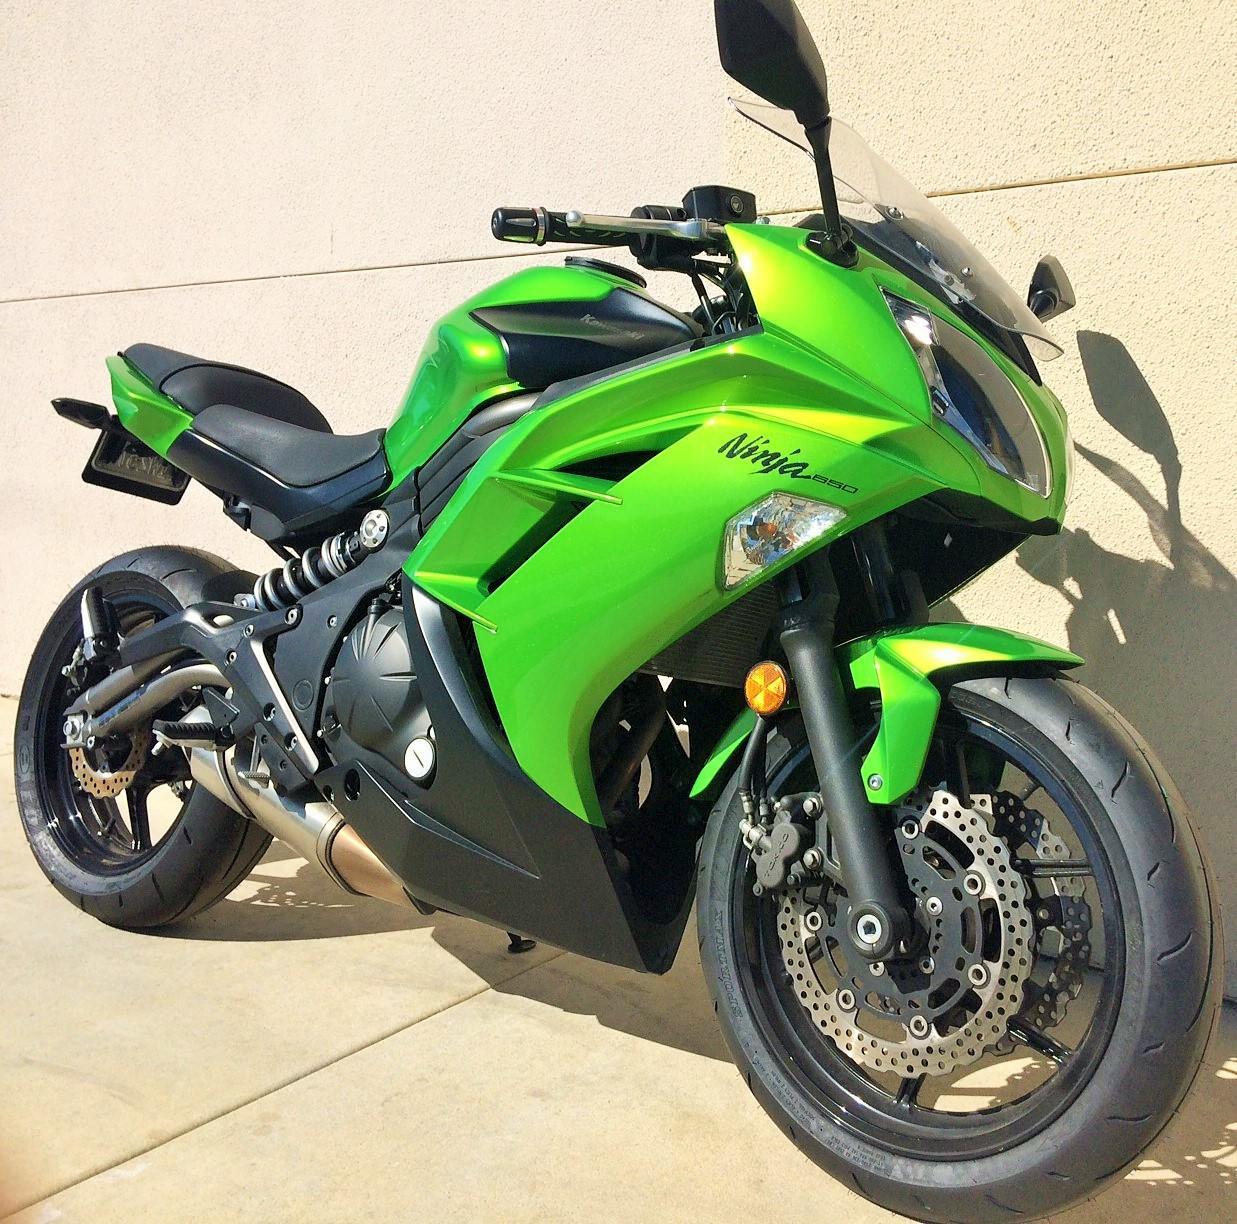 $5,900, 2012 Kawasaki NINJA 650